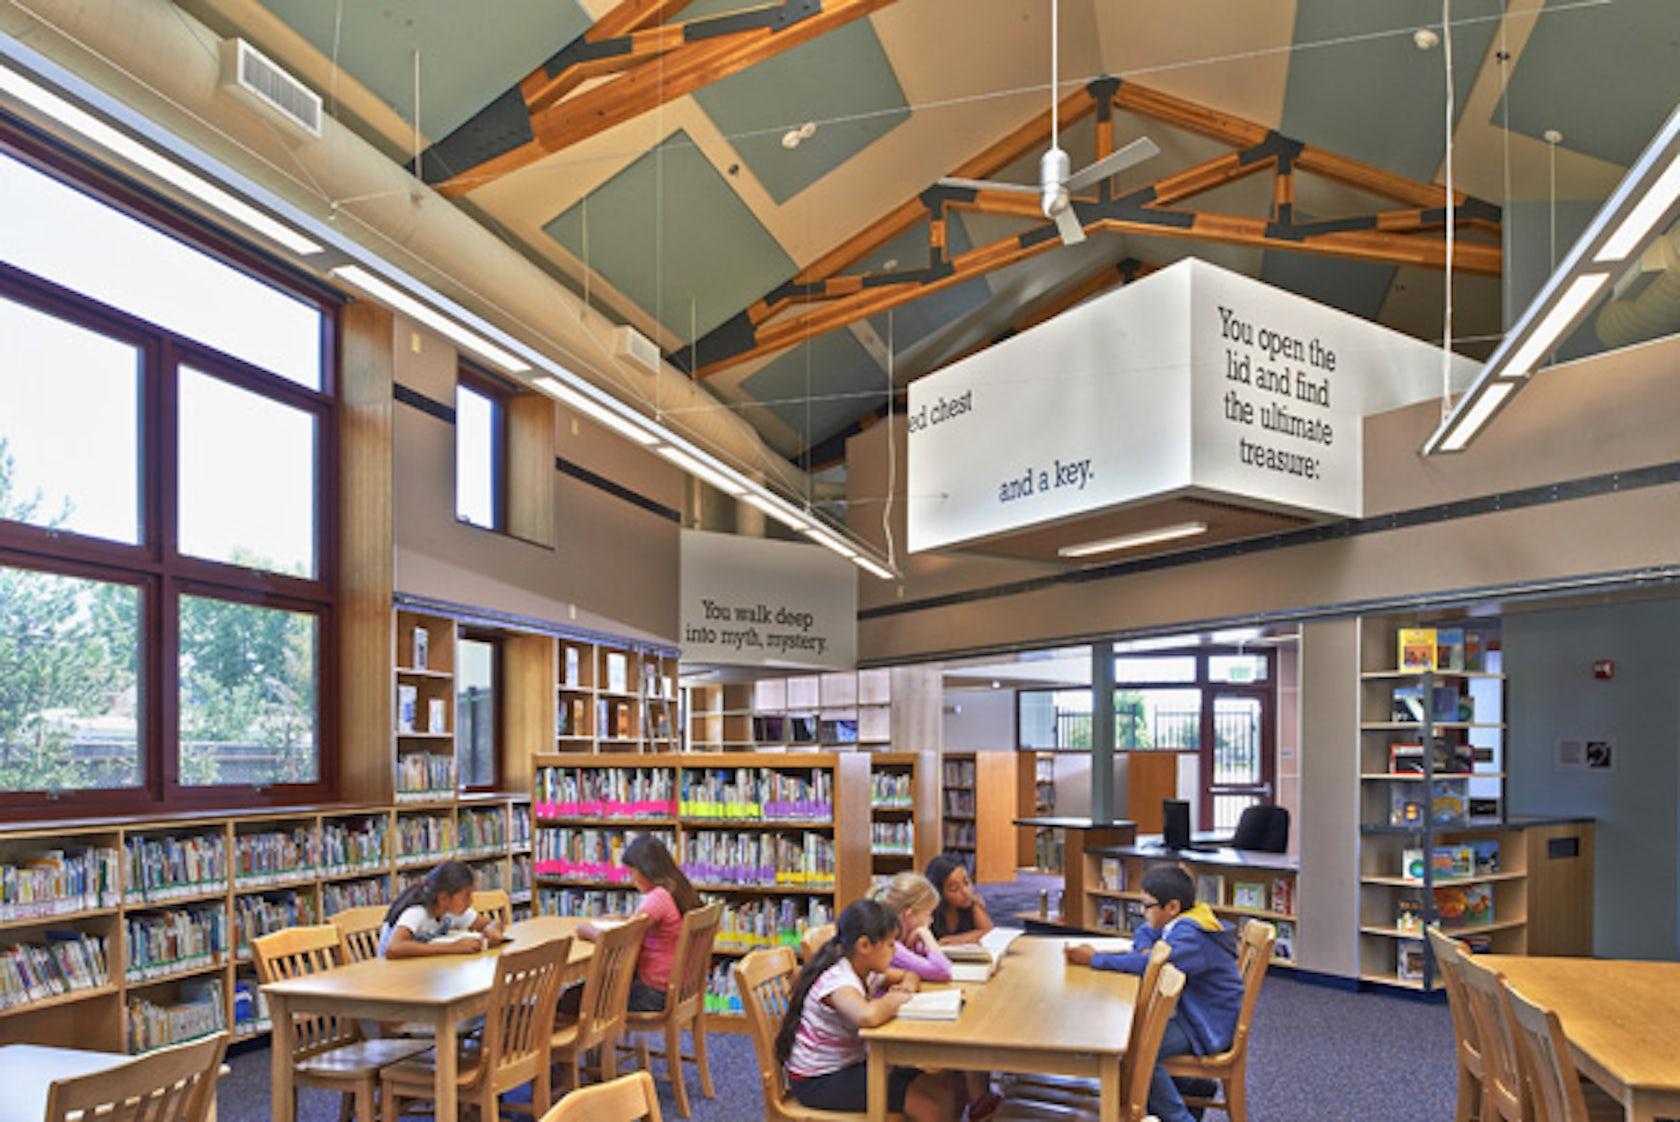 Rod Kelley Elementary School Library Architizer